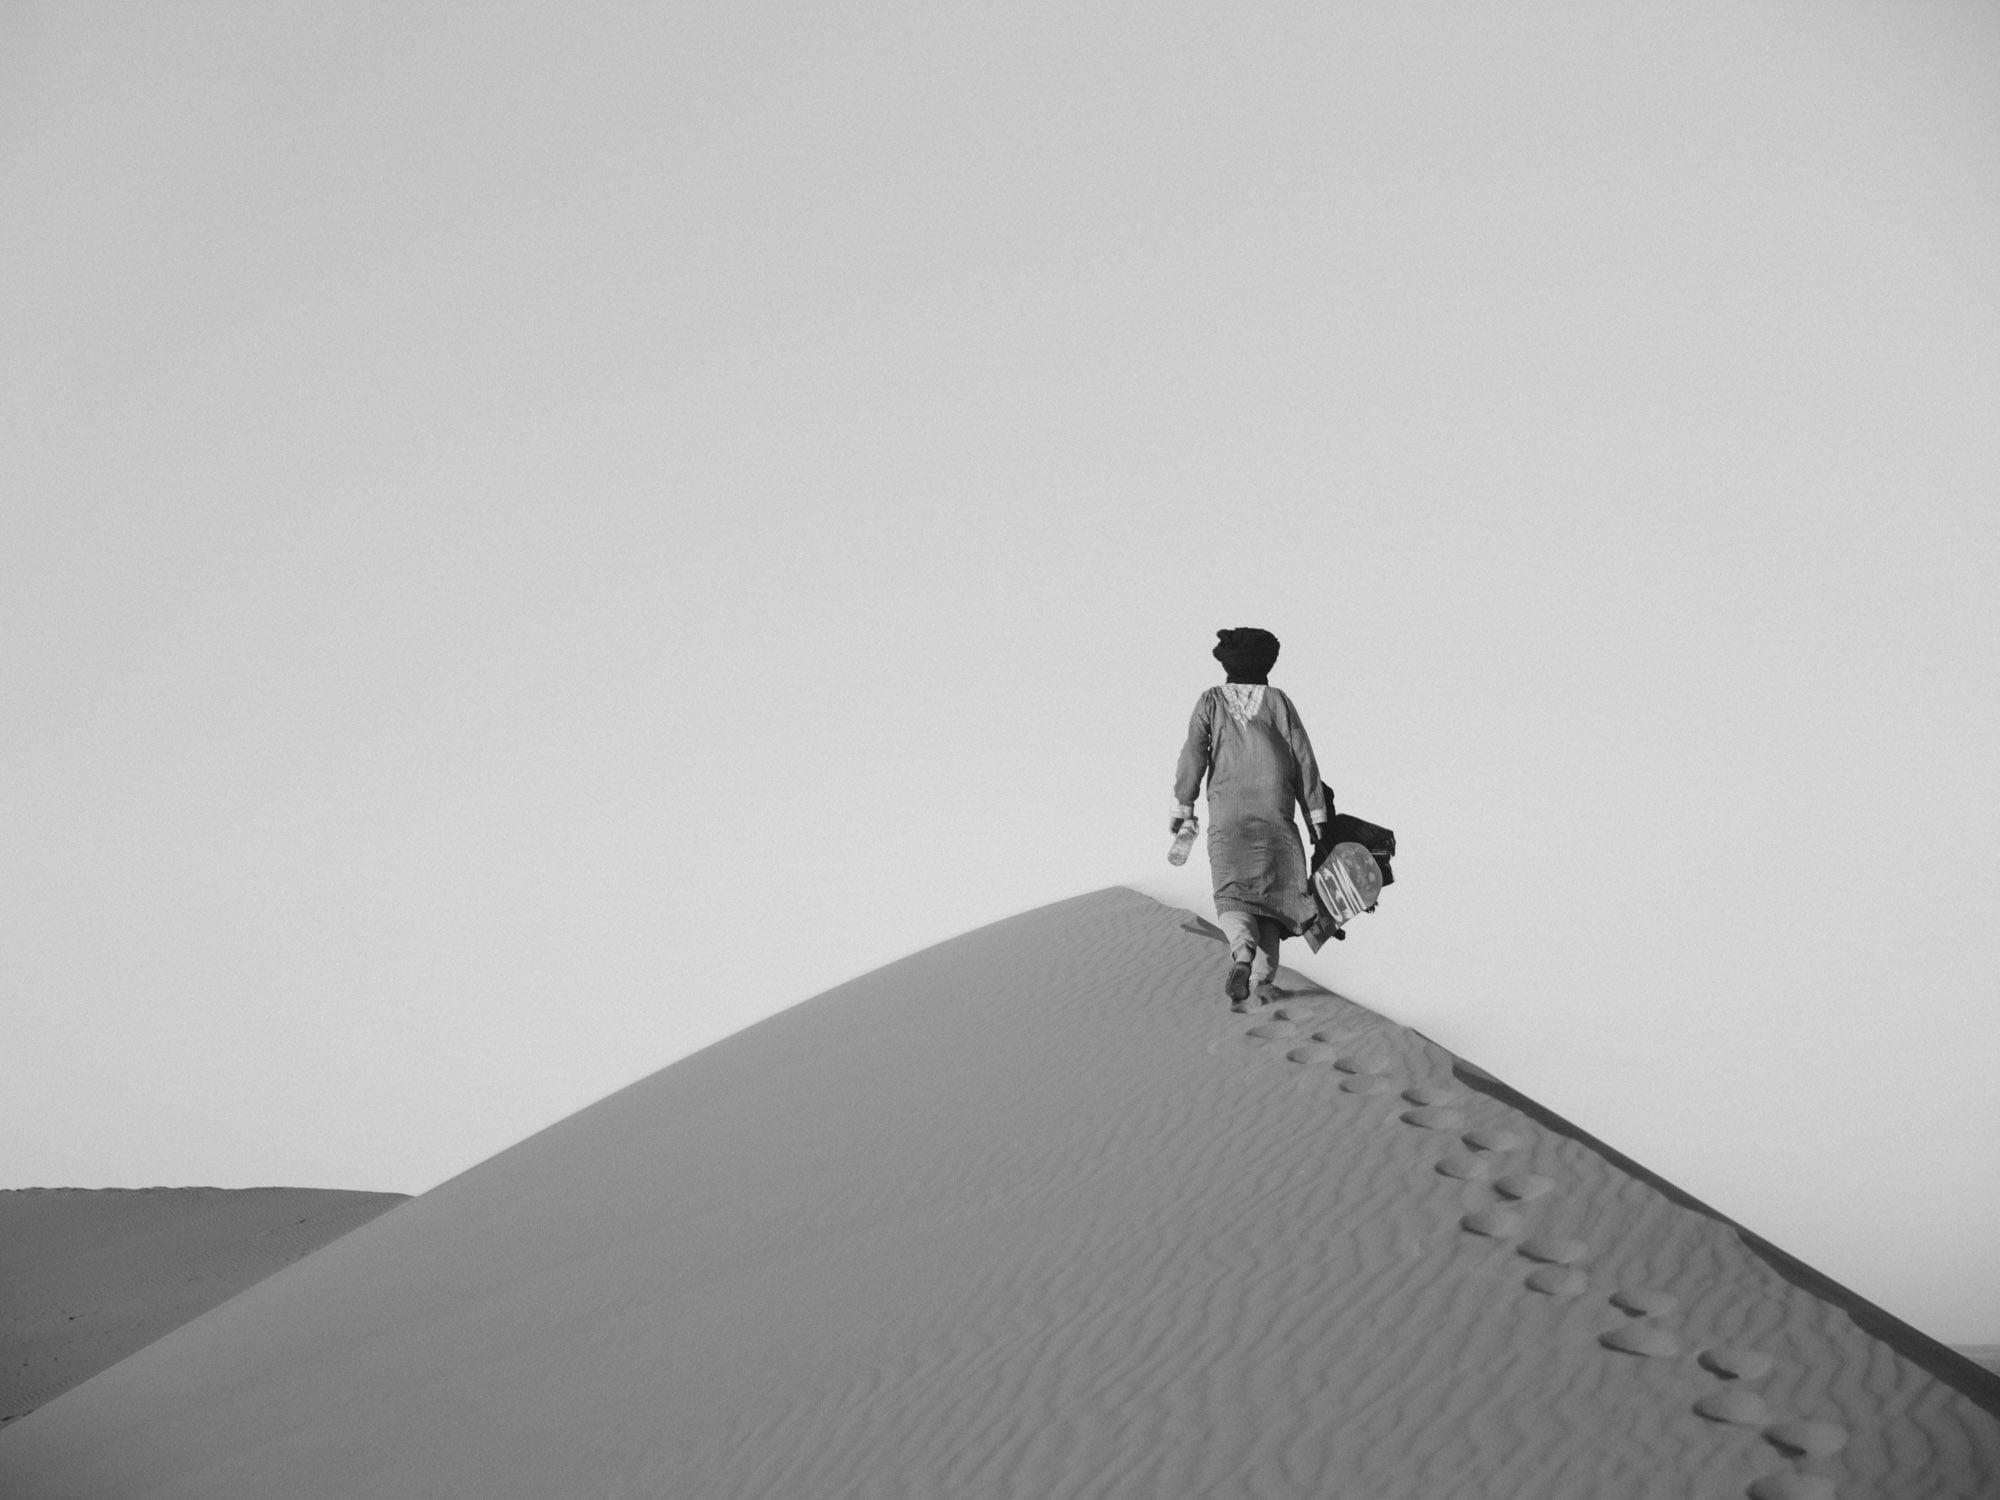 Moroccan Desert Sandboarding Instructor Walking along the Sand Dunes